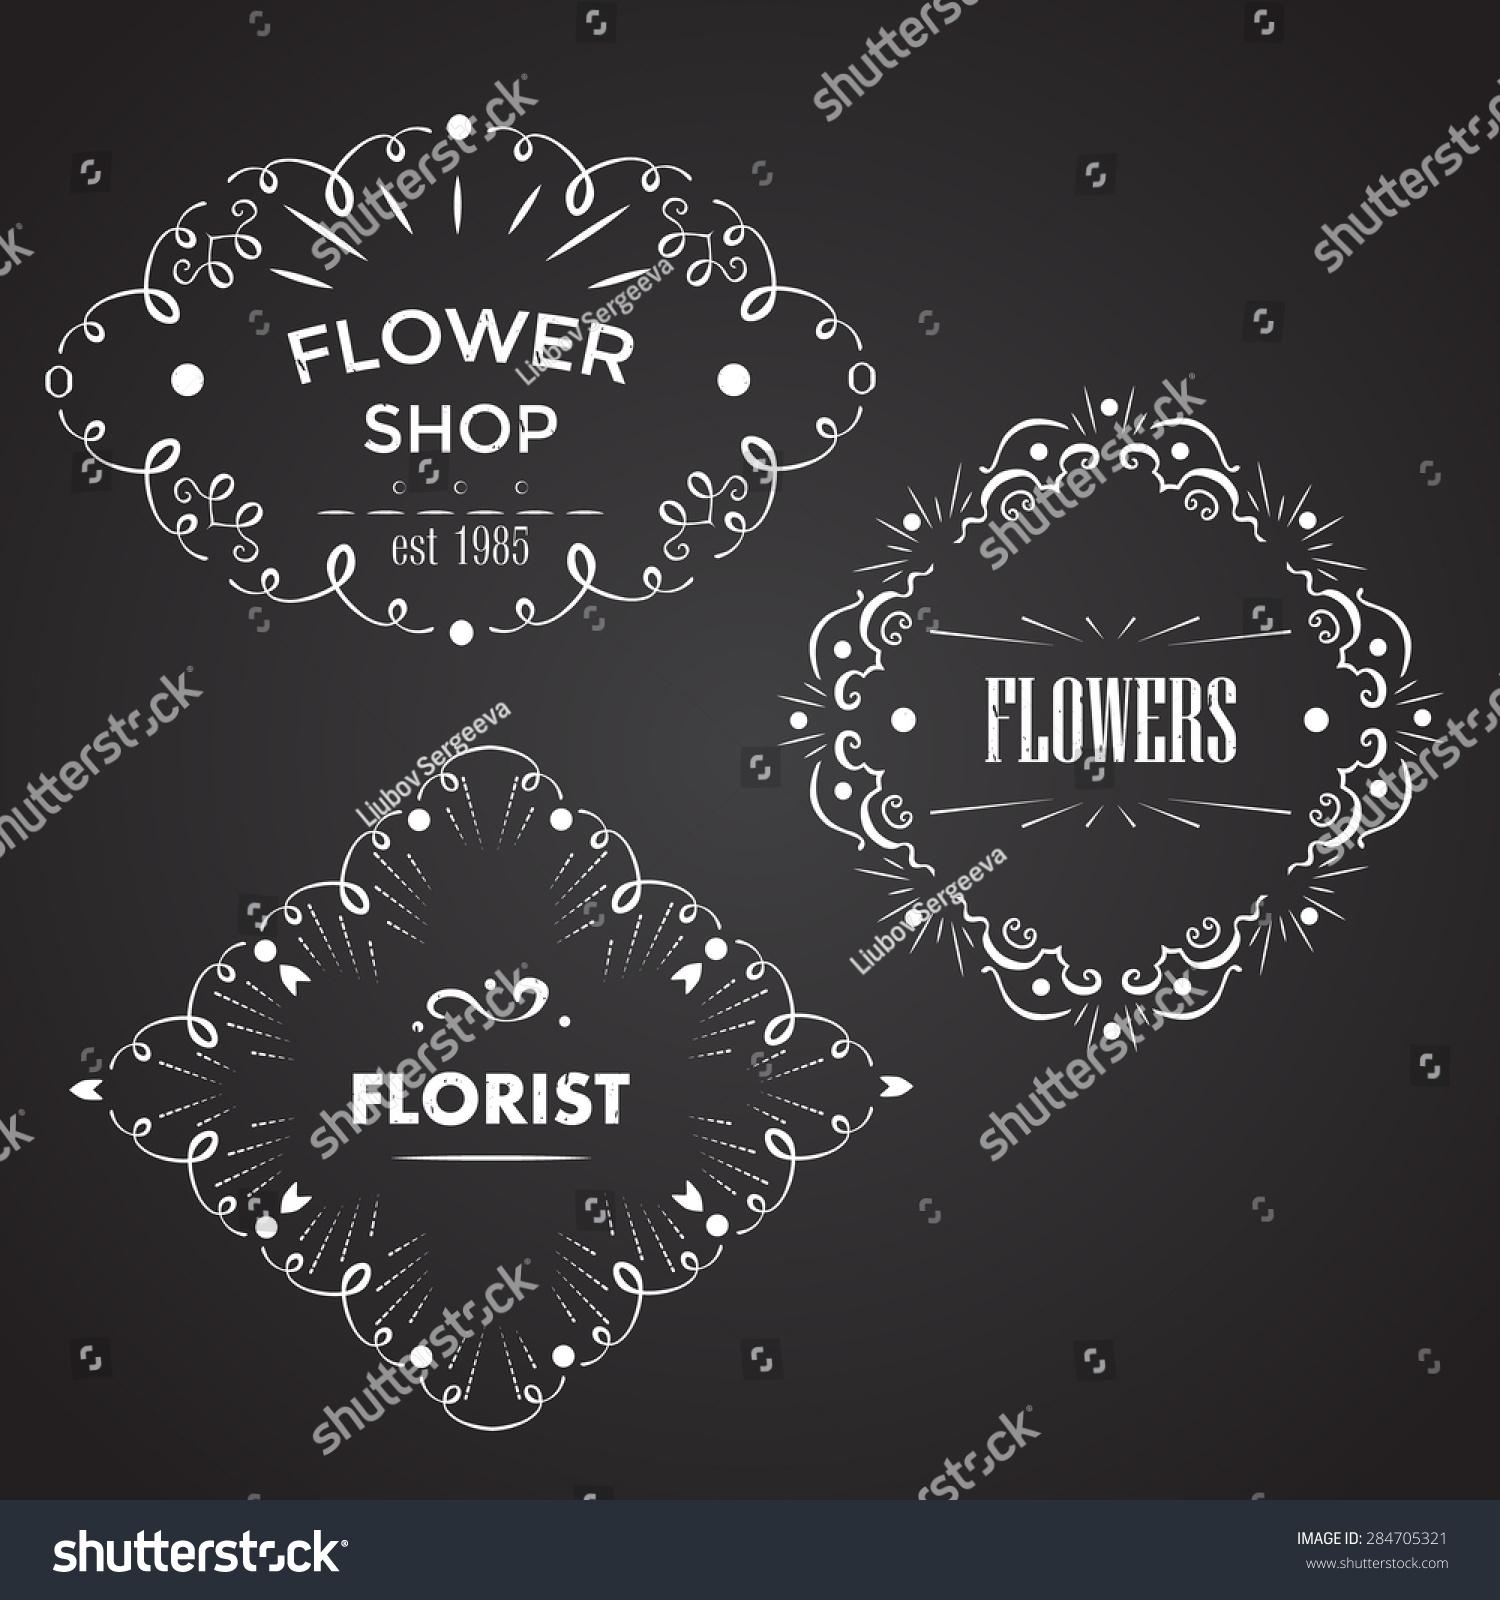 Vector Design Templates Florist Flower Shops Stock Vector (Royalty ...